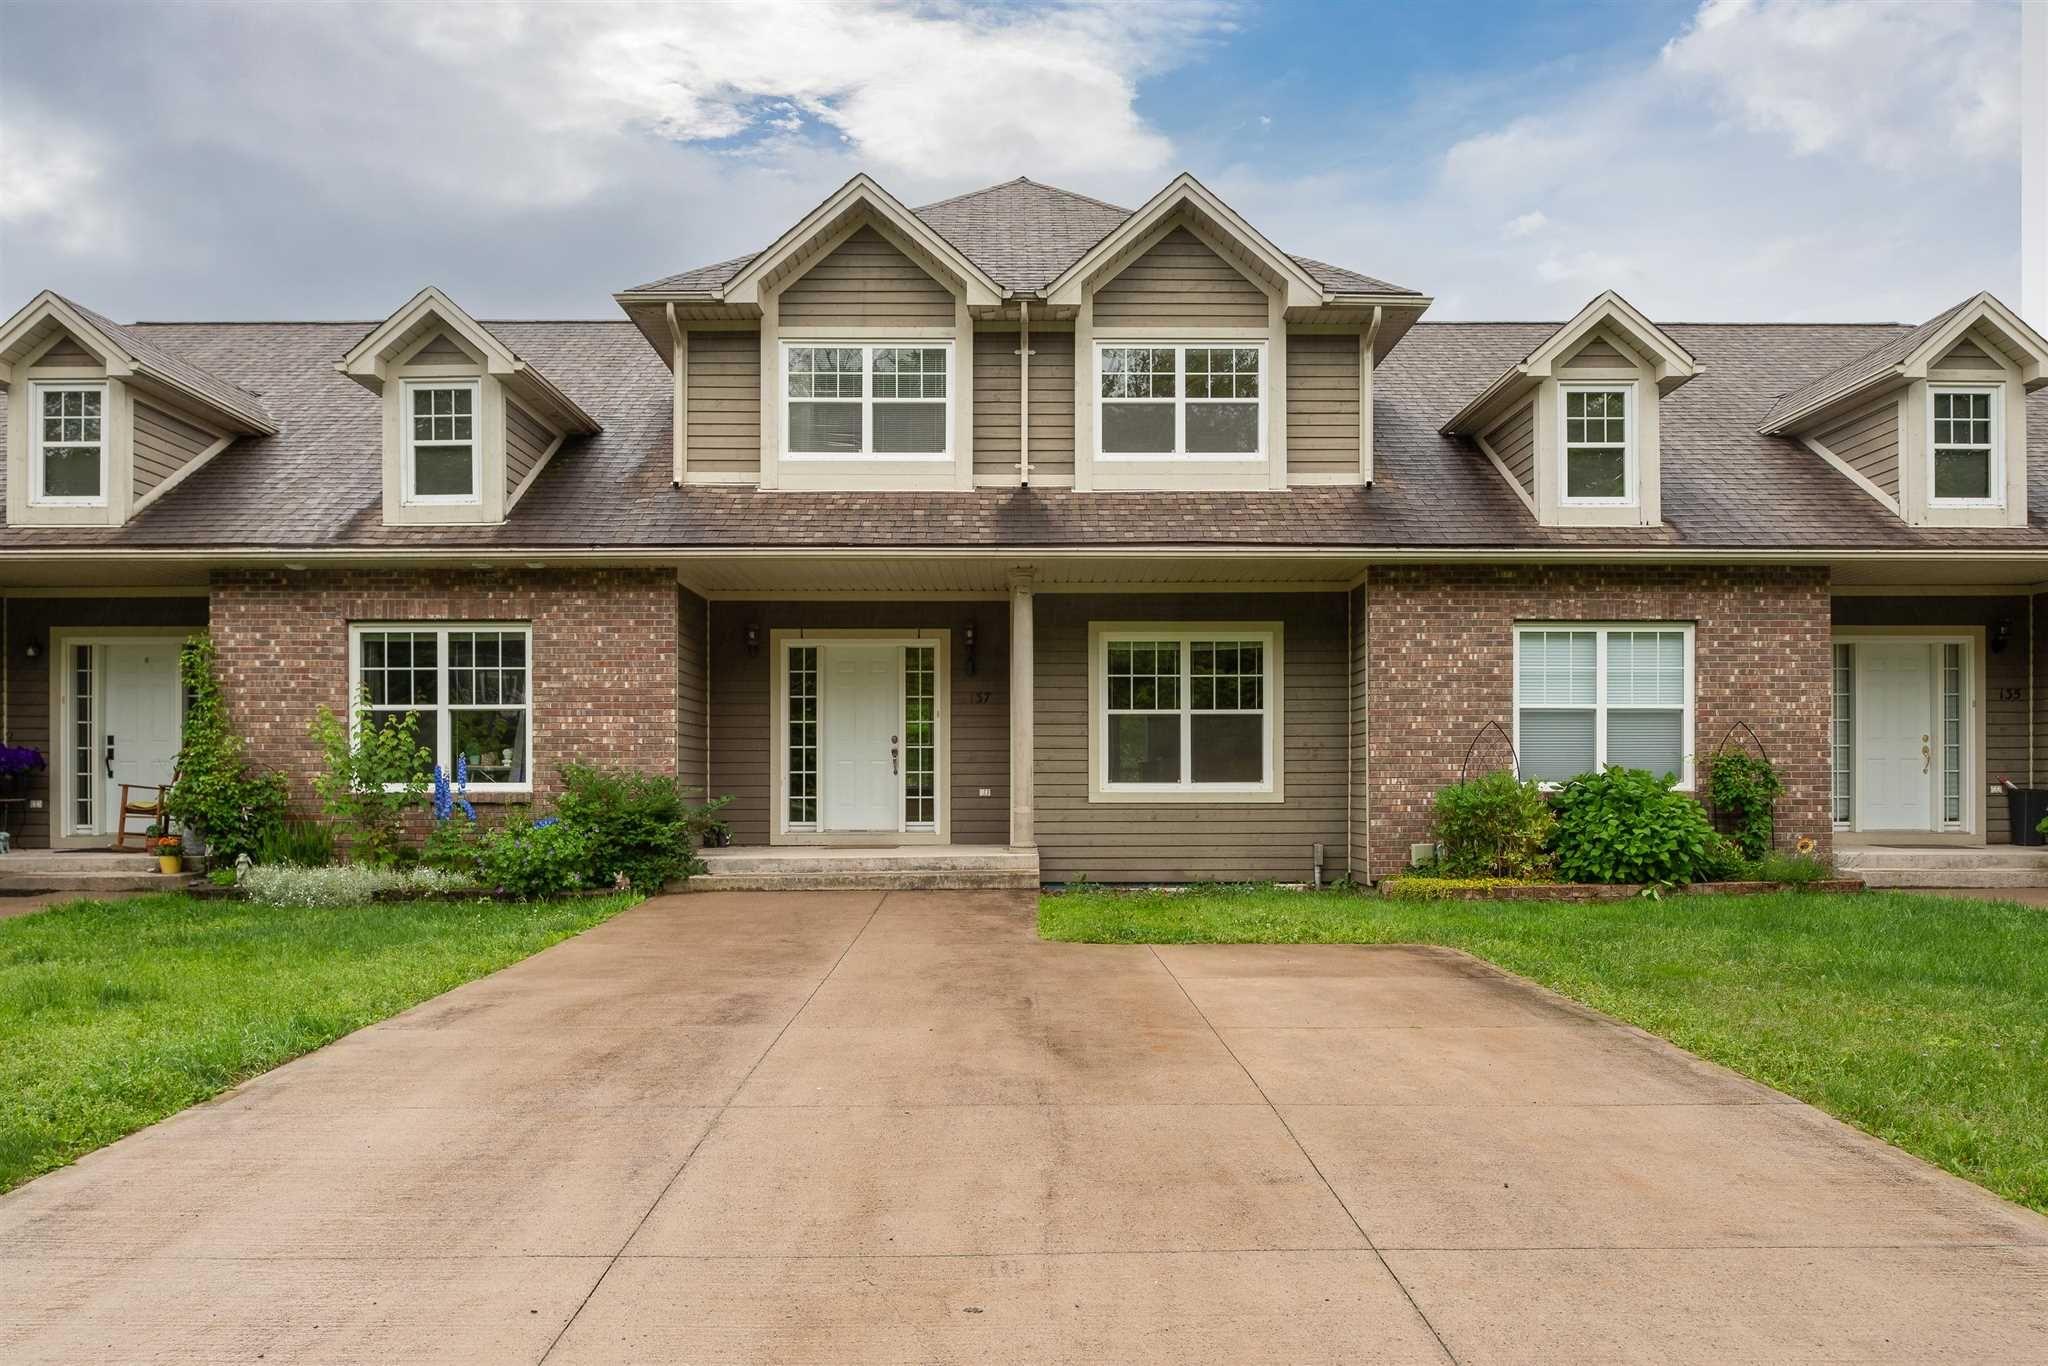 Main Photo: 137 Carnoustie Drive in Hammonds Plains: 21-Kingswood, Haliburton Hills, Hammonds Pl. Residential for sale (Halifax-Dartmouth)  : MLS®# 202117287